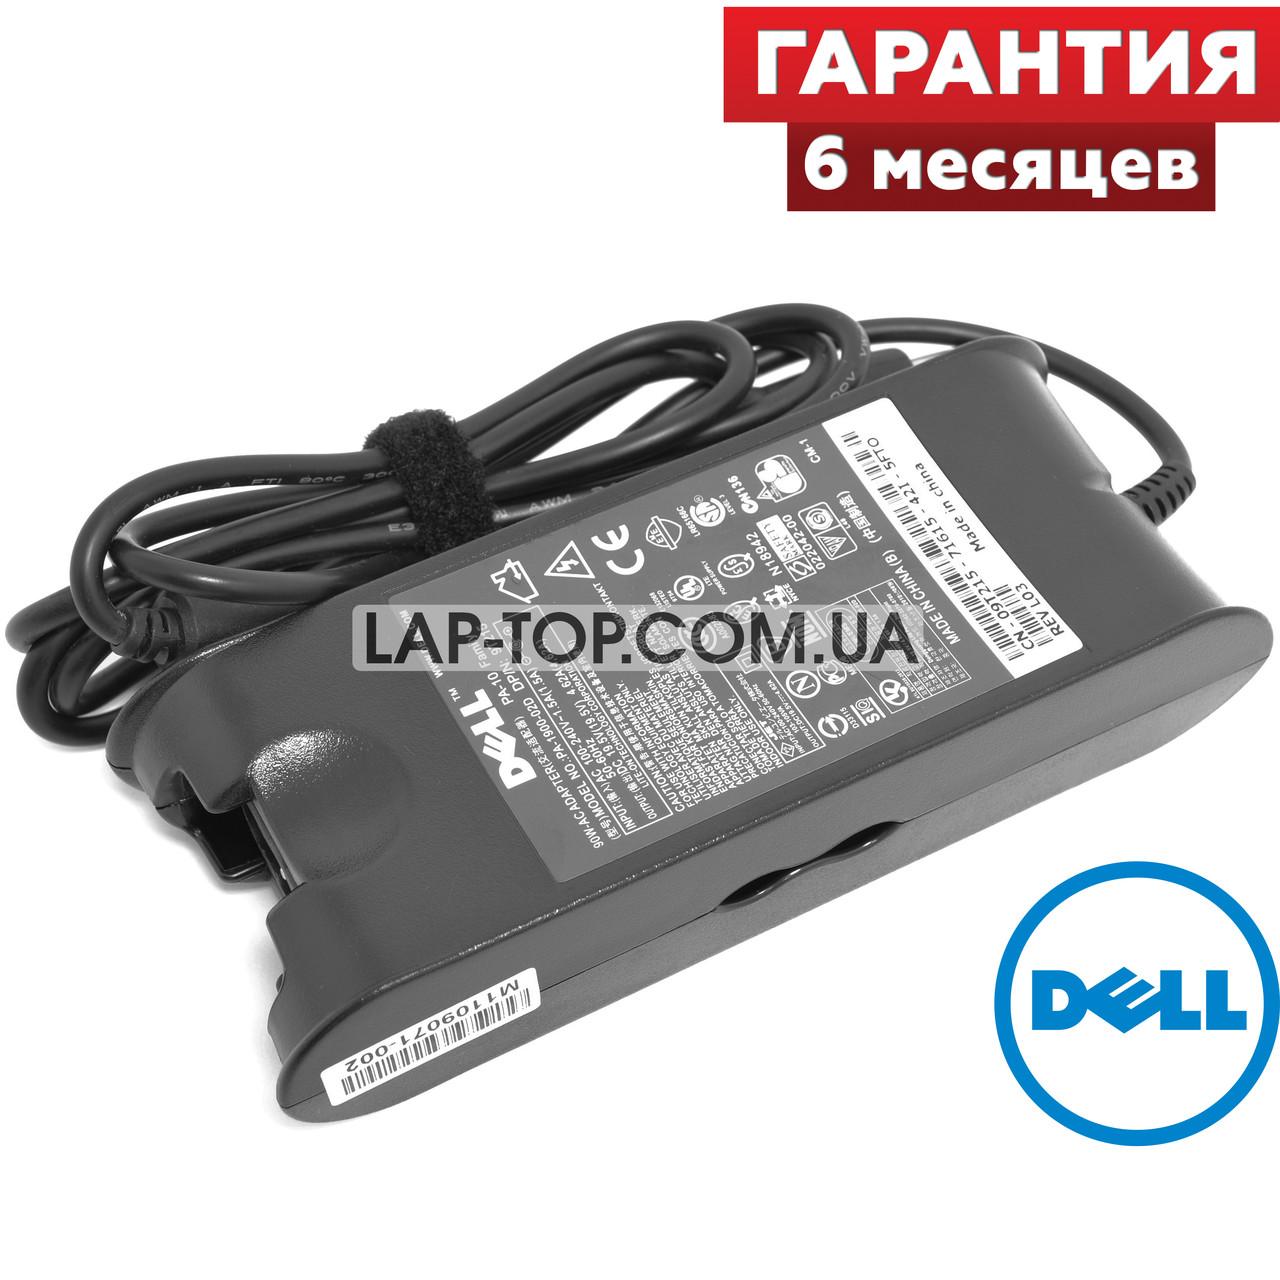 Блок питания для ноутбука DELL 19.5V 4.62A 90W 7.4*5.0